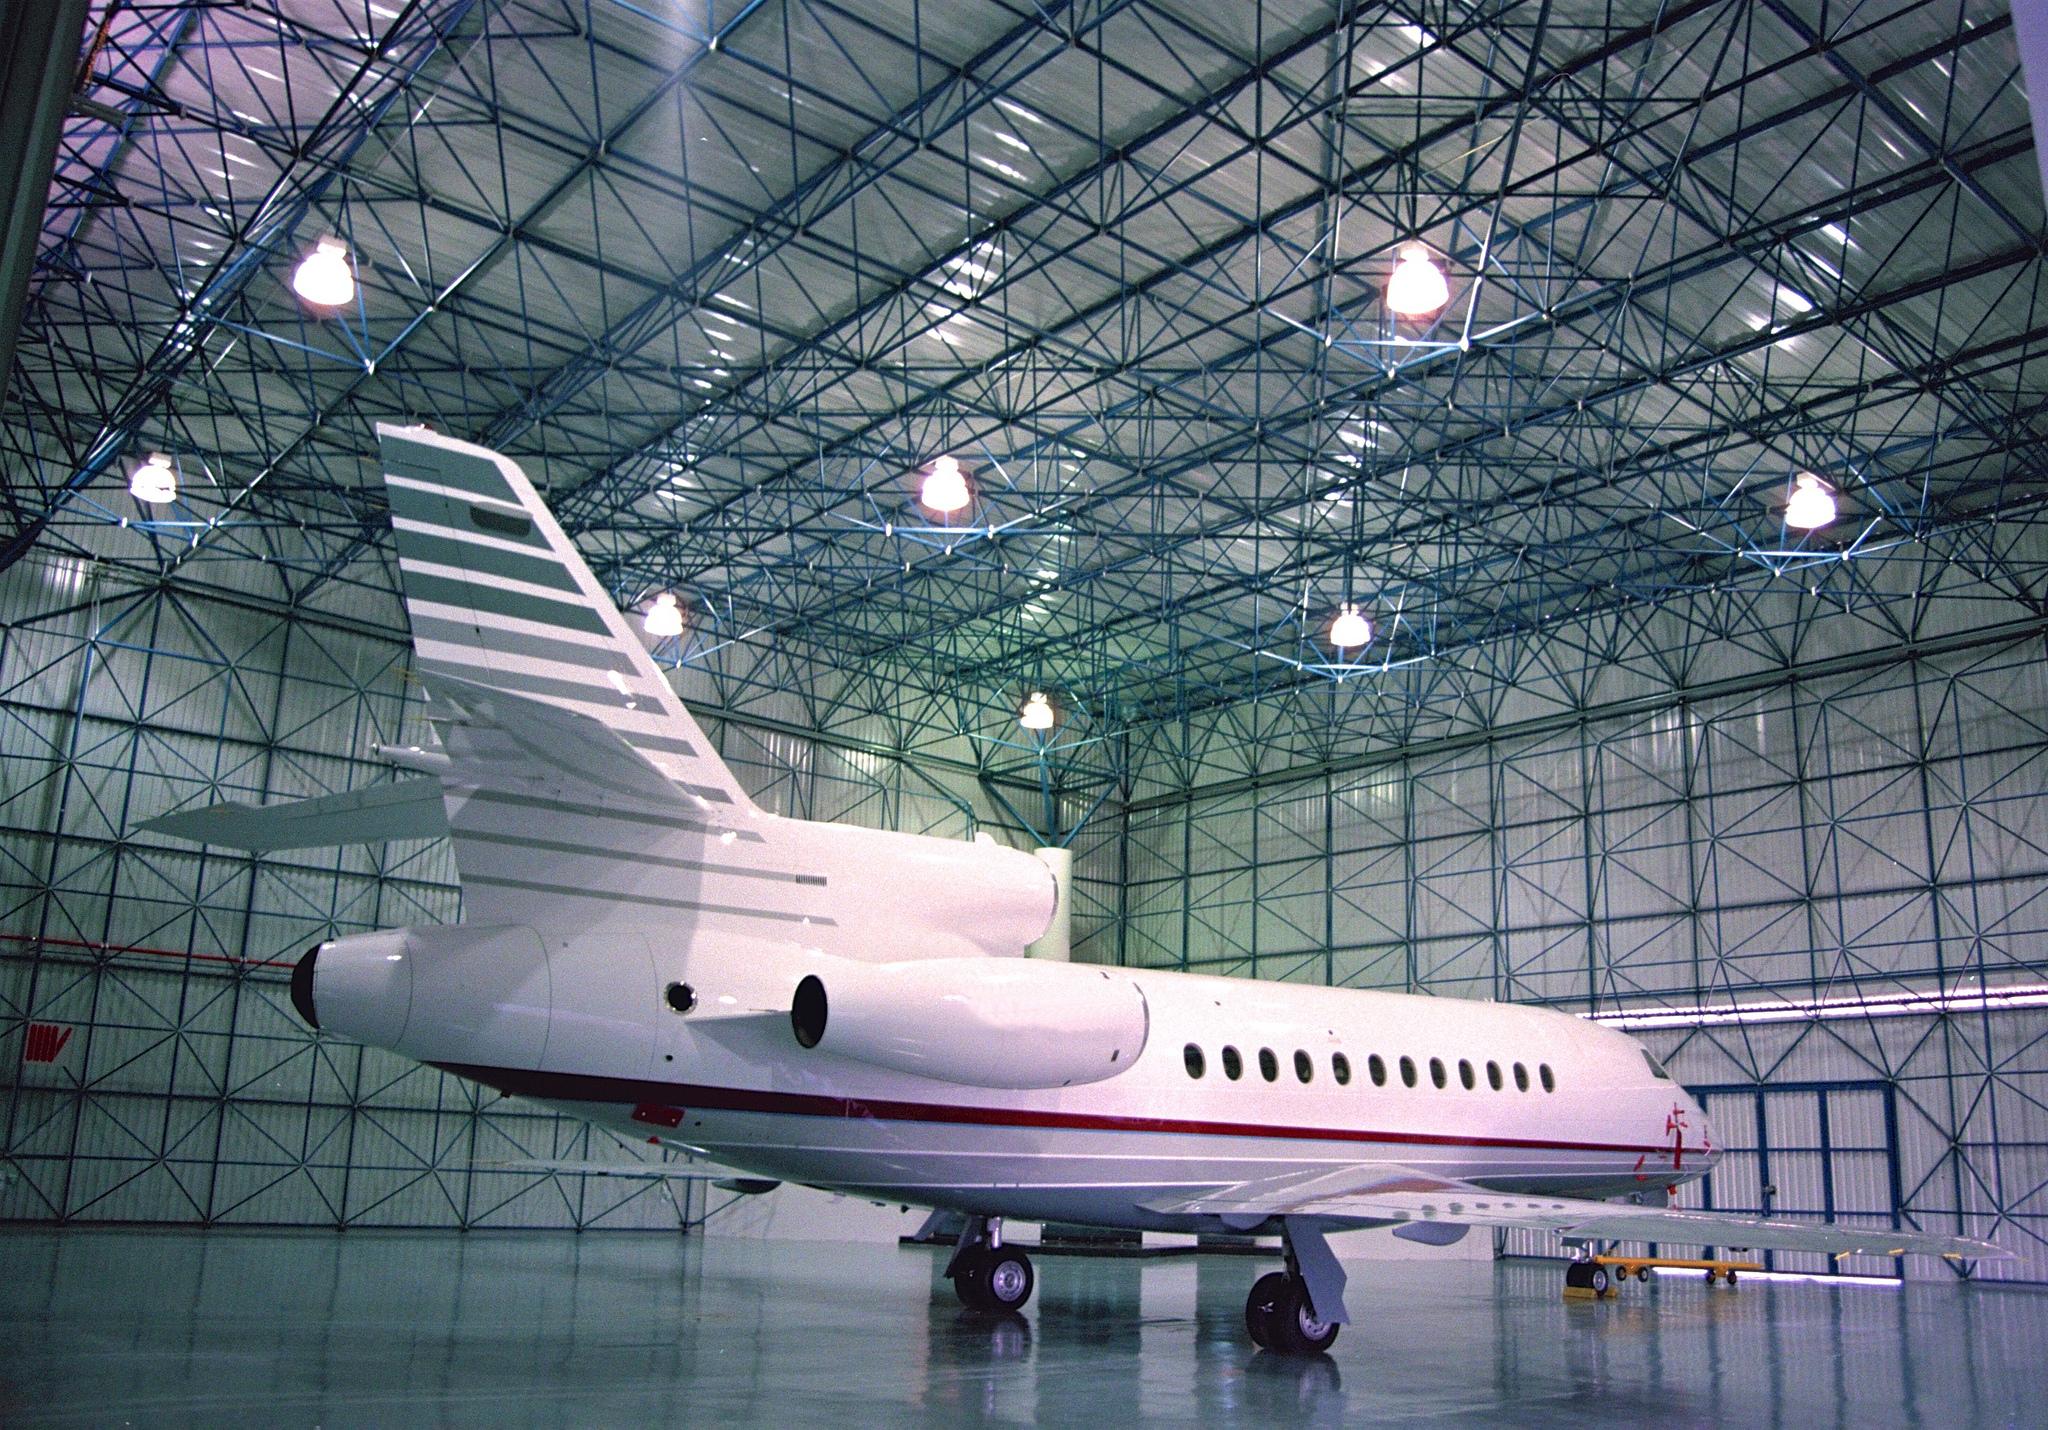 Corporate Hangar - 60m span space frame